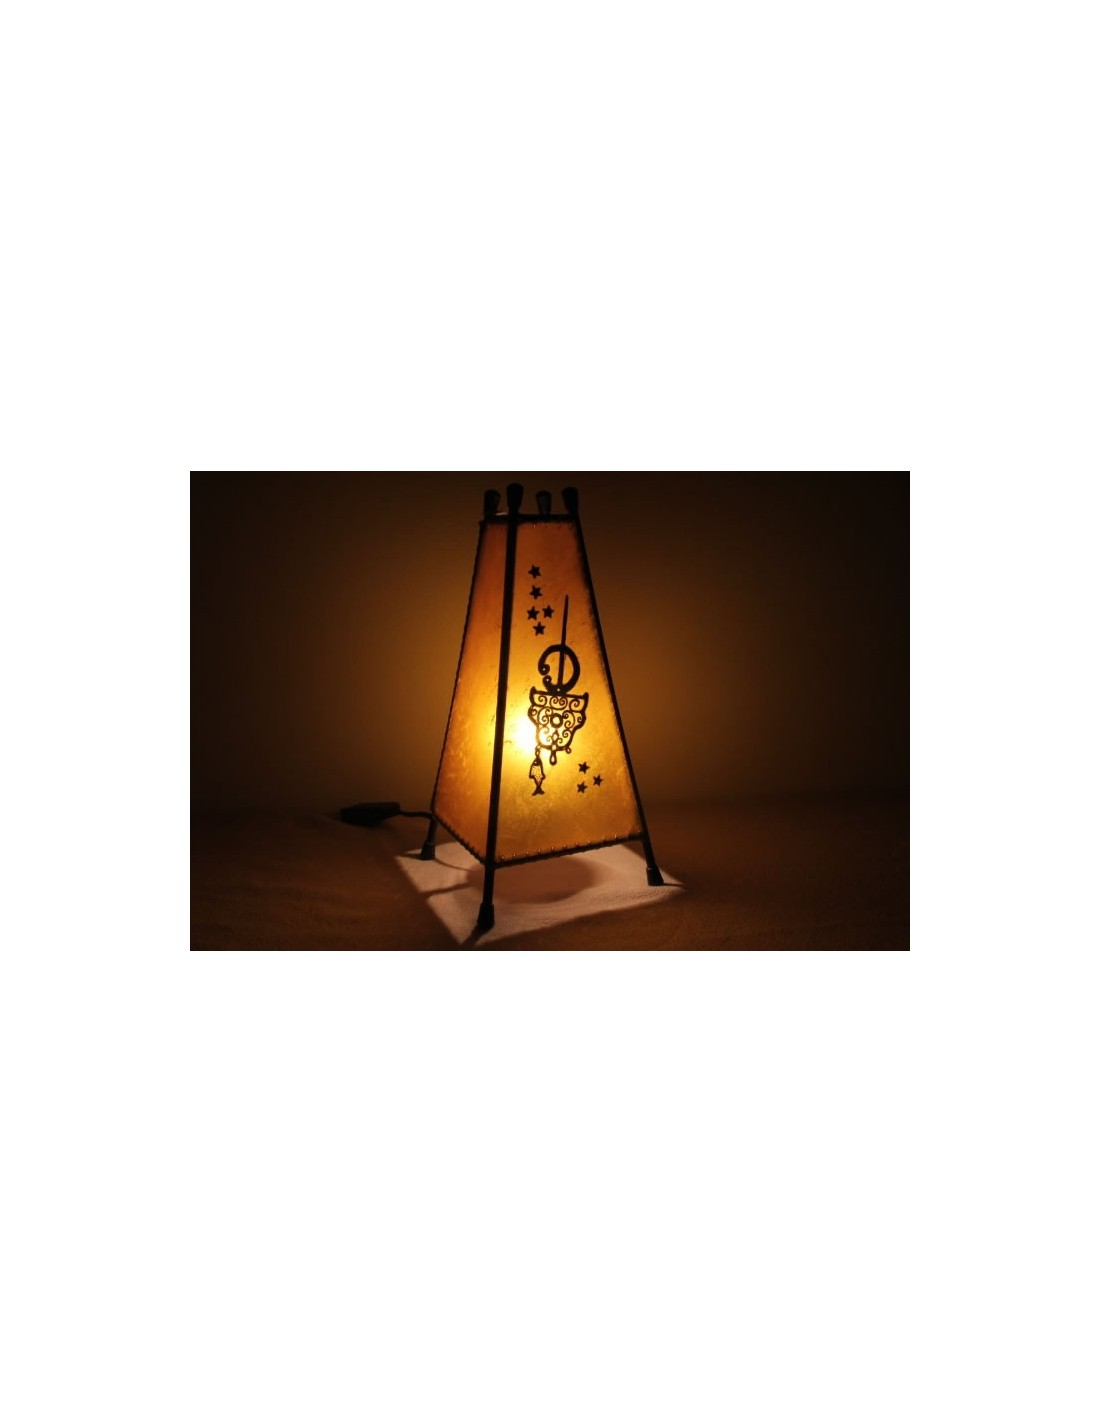 lampe de table moyenne jaune khlel la medina shop. Black Bedroom Furniture Sets. Home Design Ideas